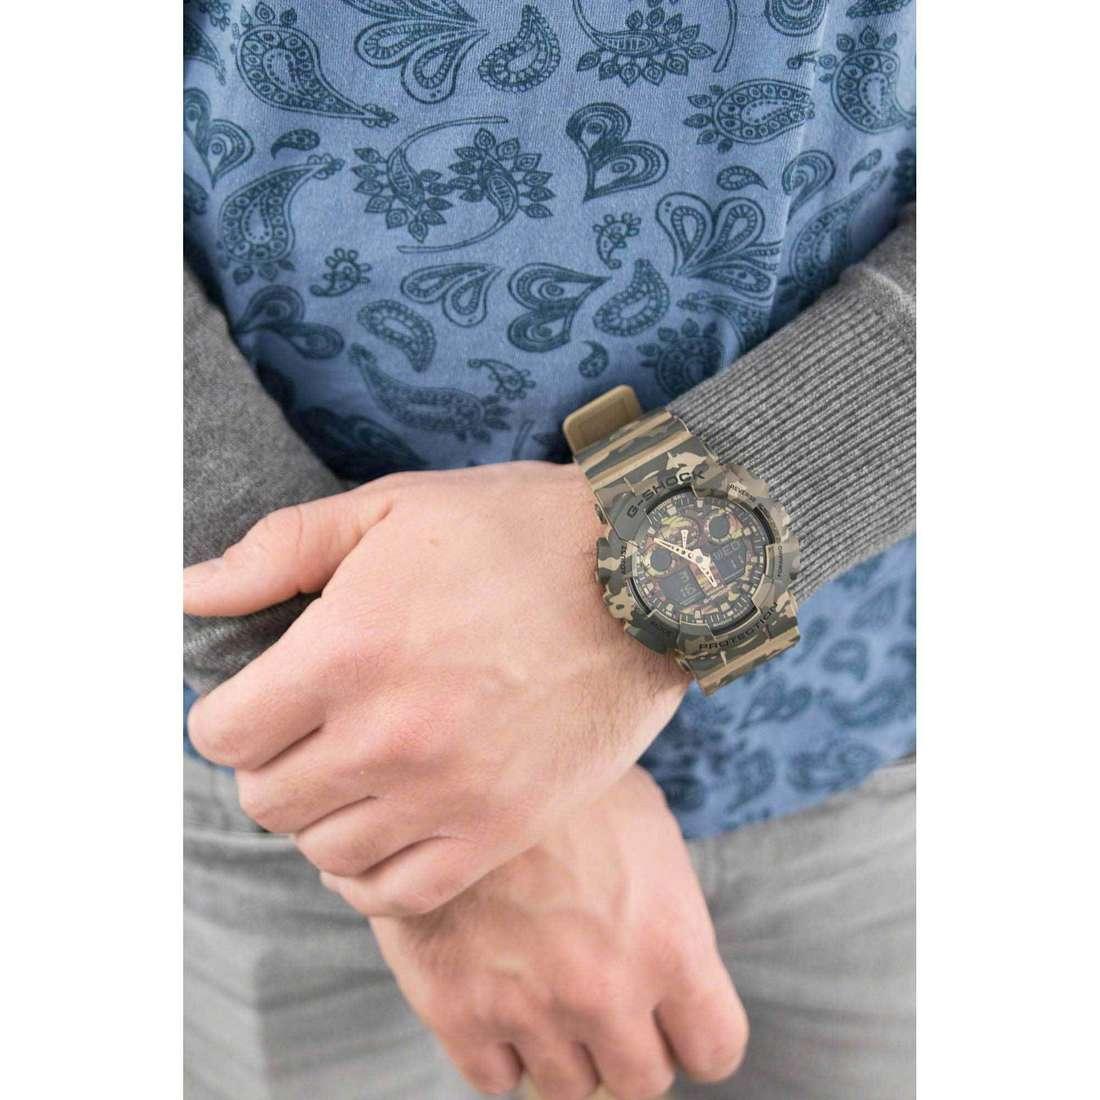 Casio digitali G-Shock uomo GA-100CM-5AER indosso